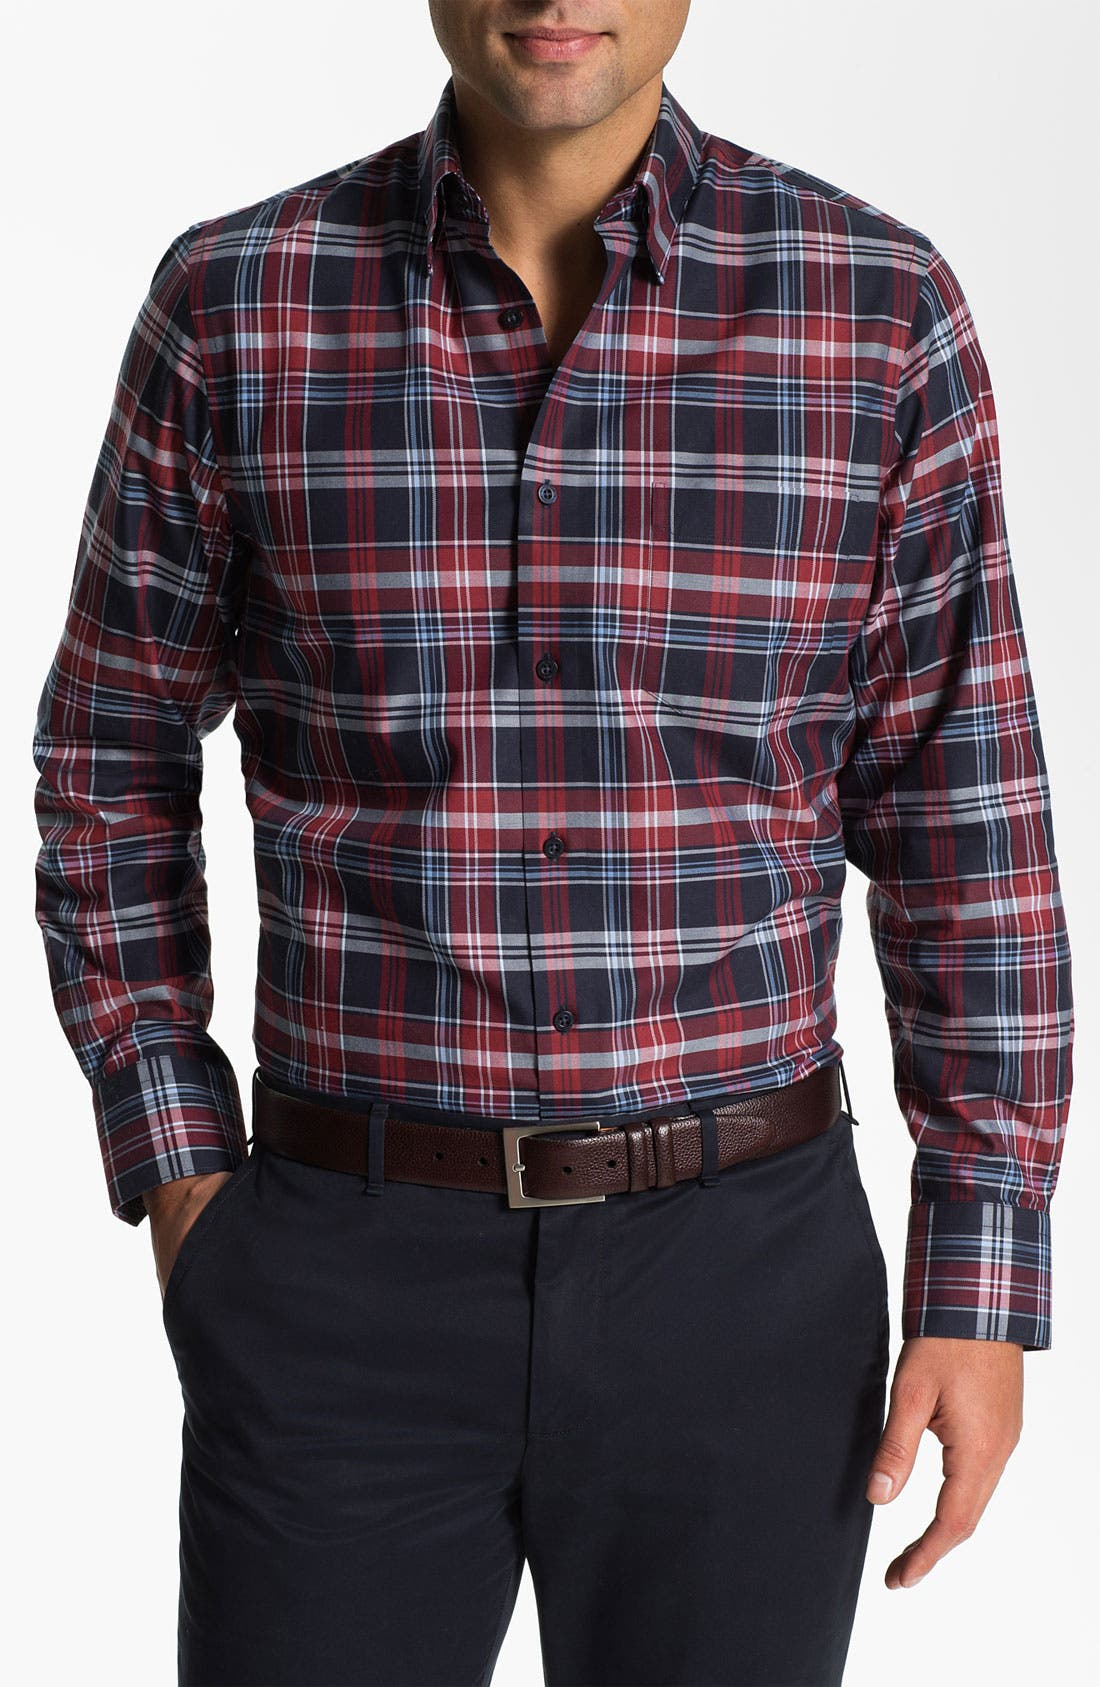 Alternate Image 1 Selected - Nordstrom Regular Fit Twill Sport Shirt